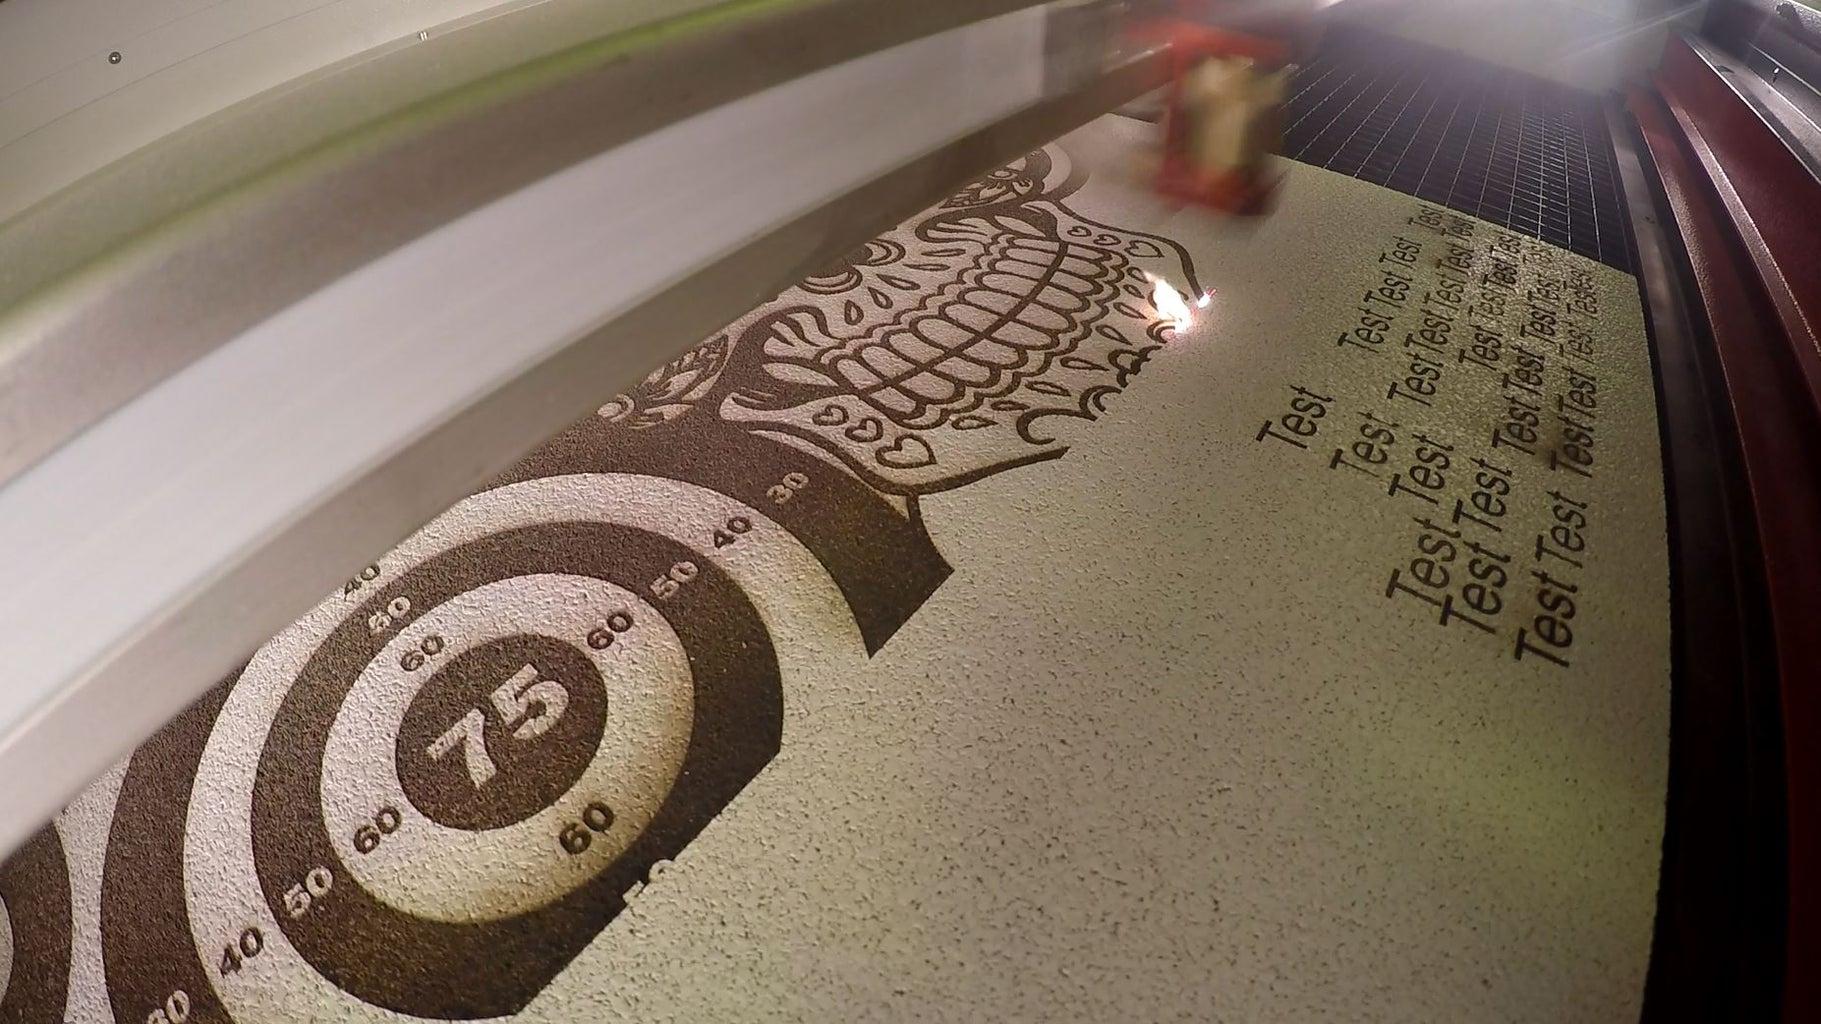 Engrave the Cork